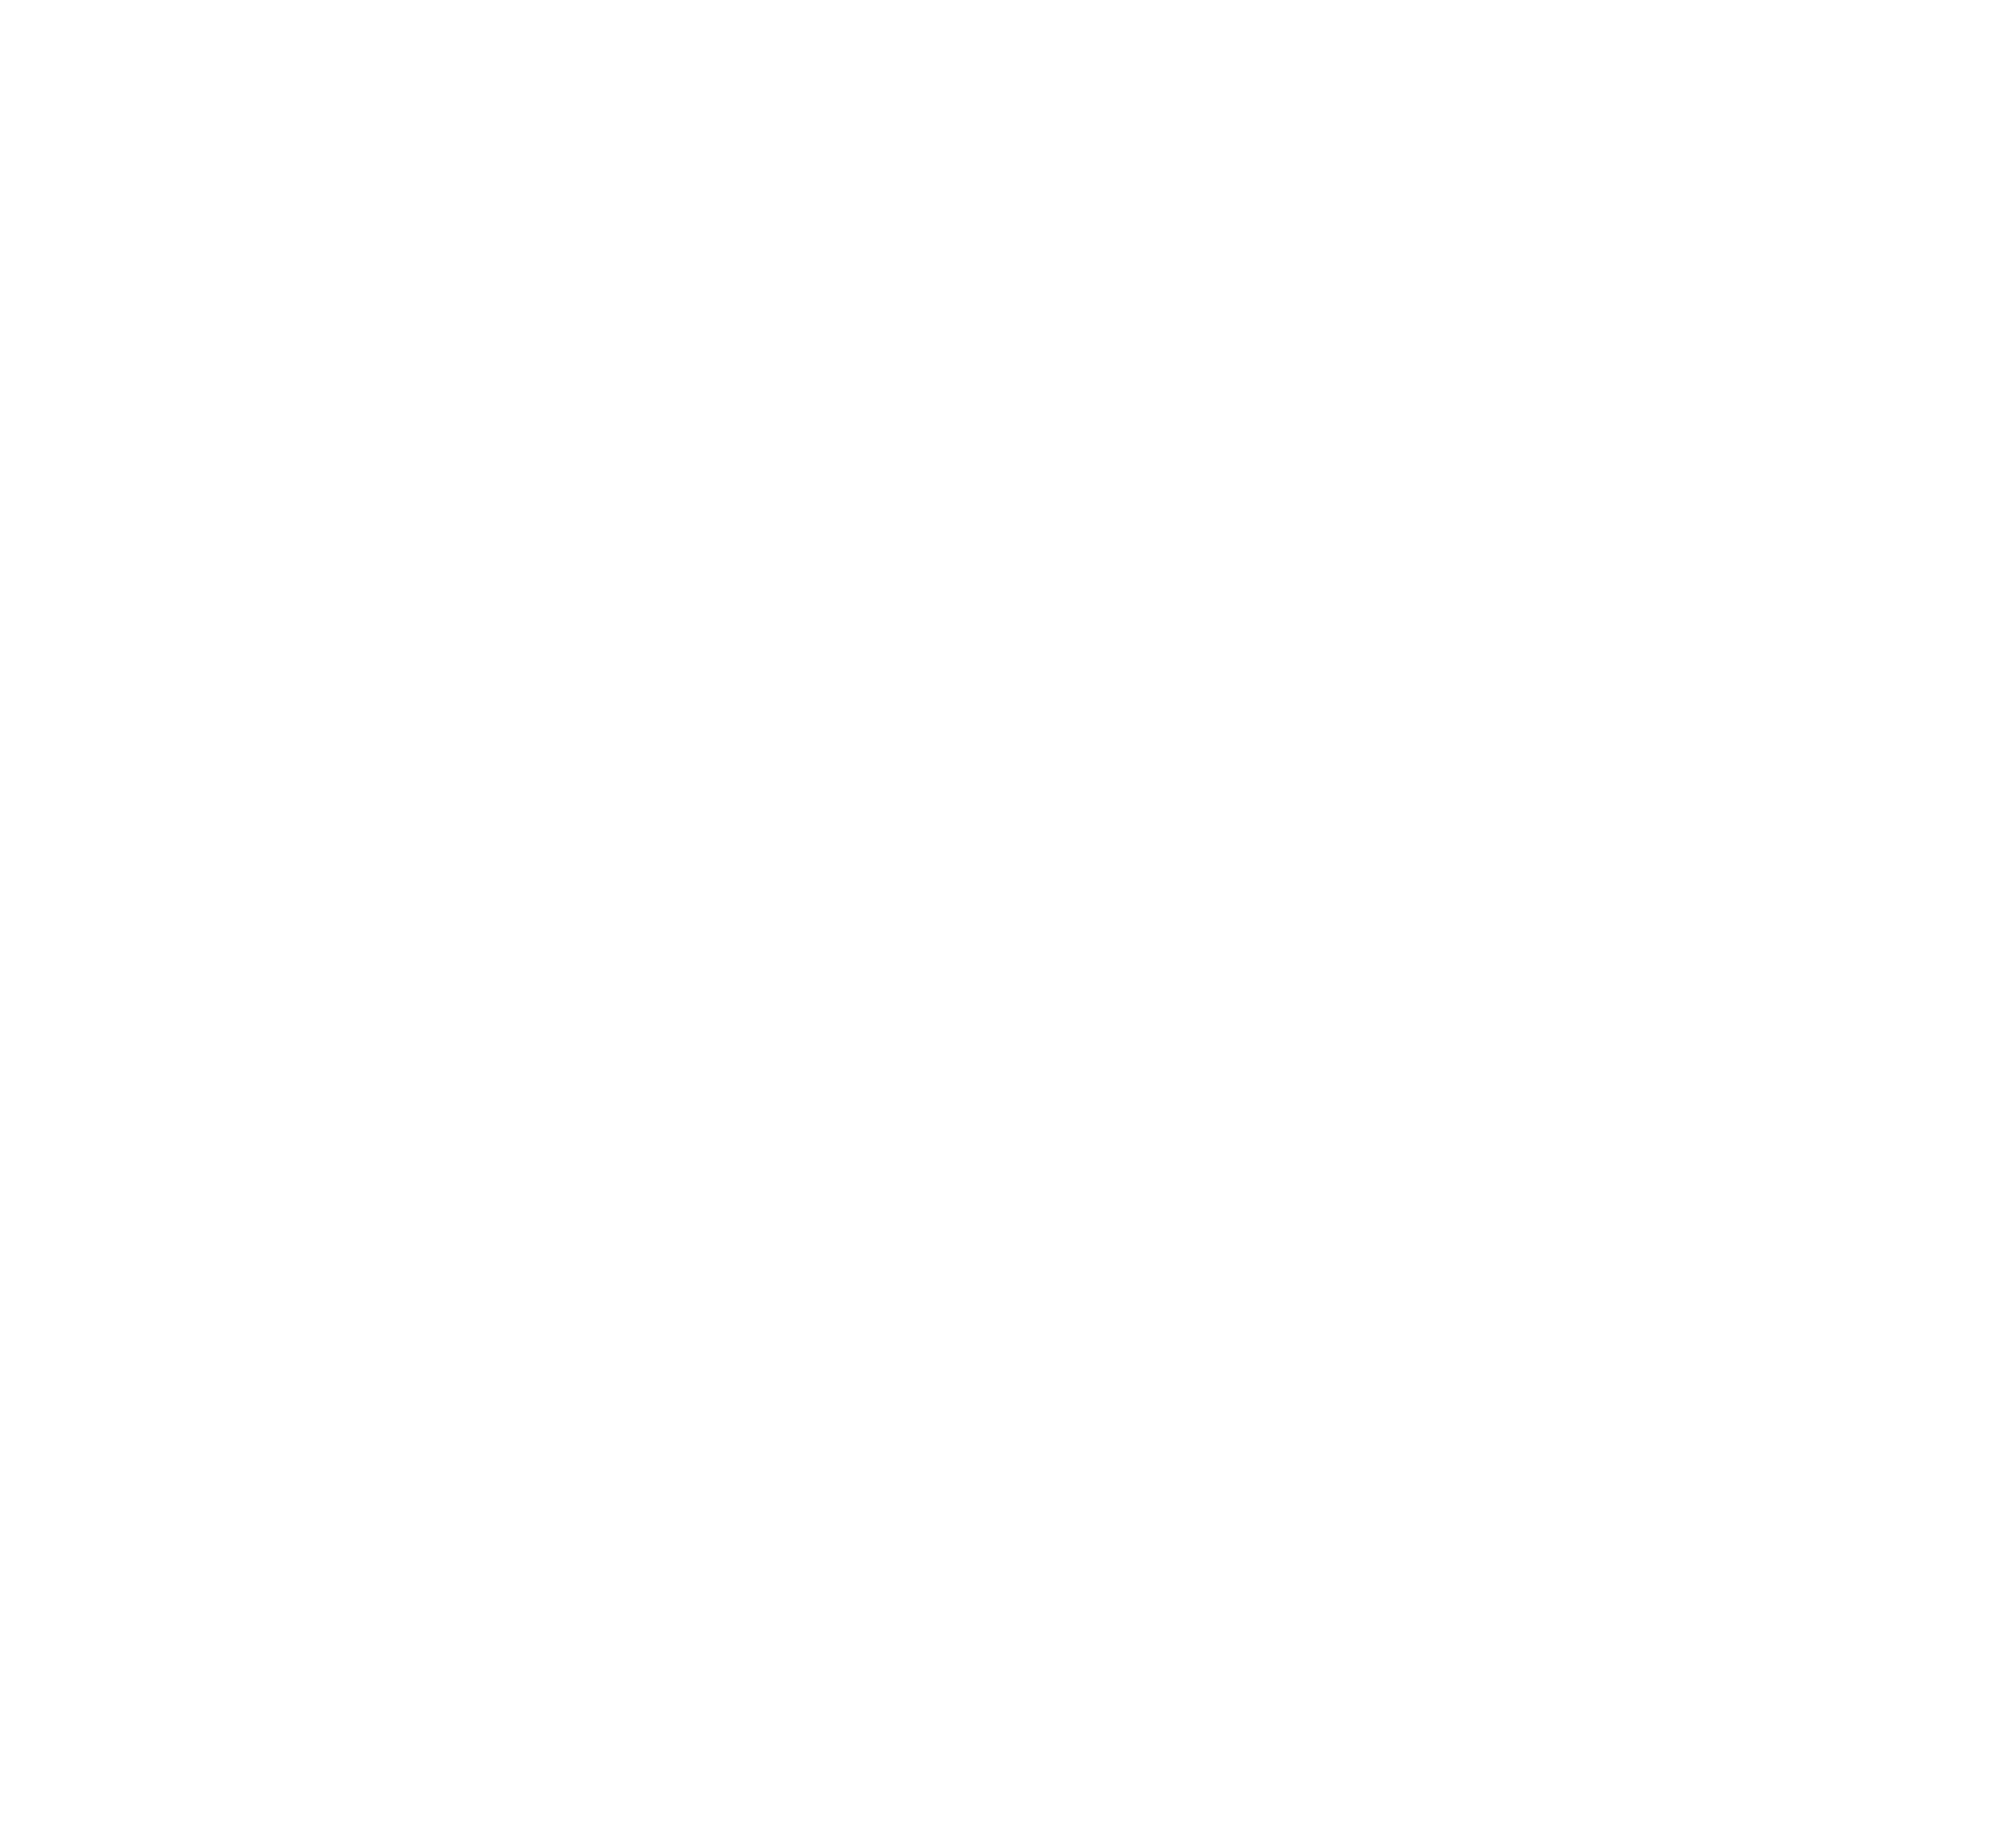 Startupfestival Sponsor - Ubisoft